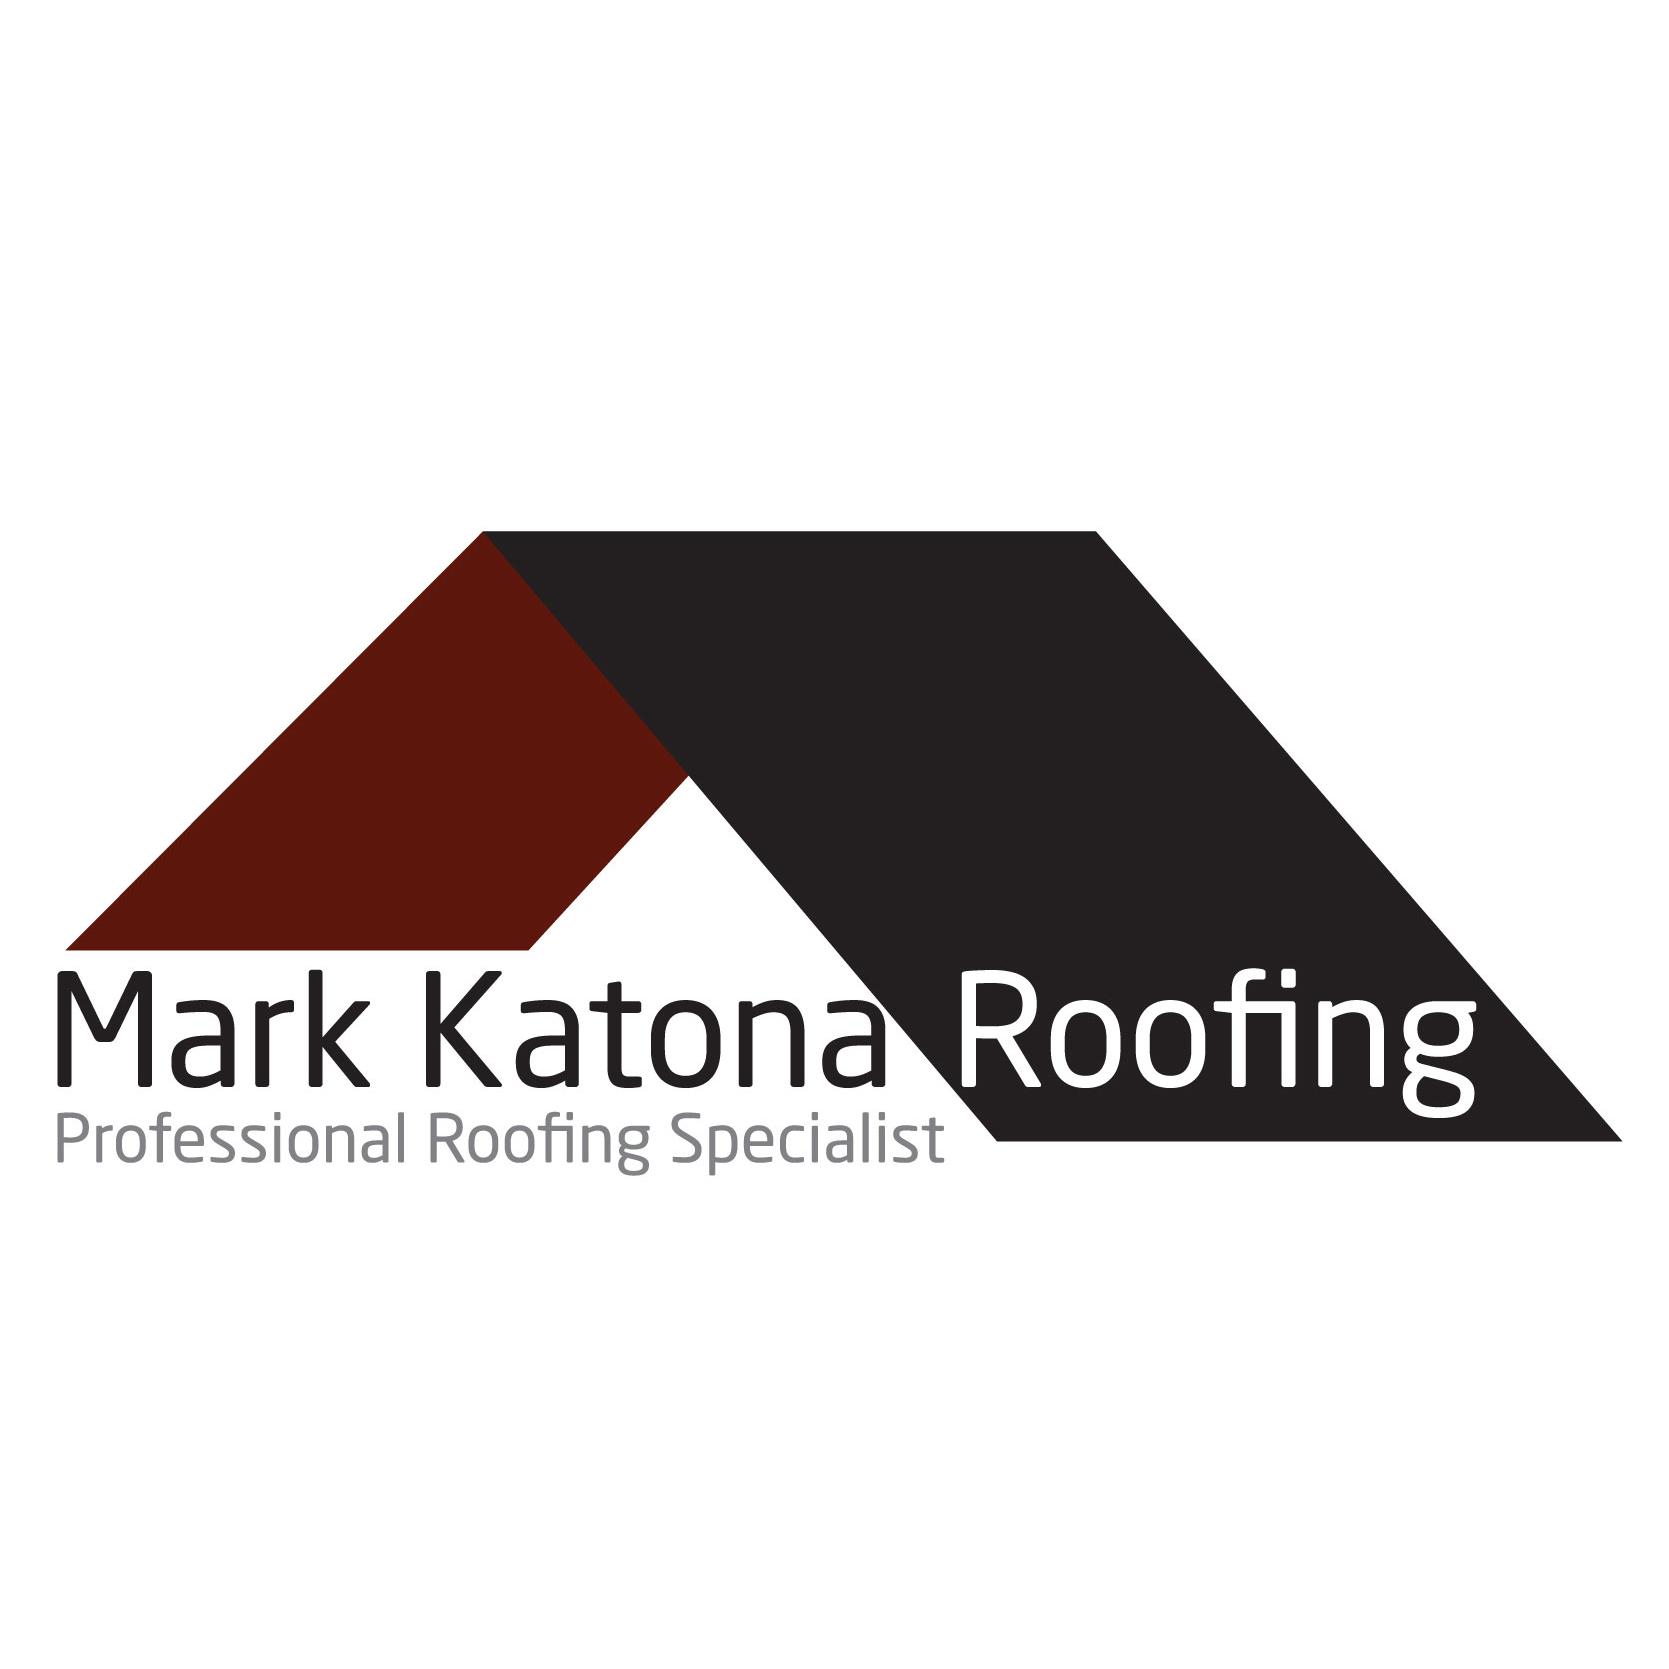 Mark Katona Roofing